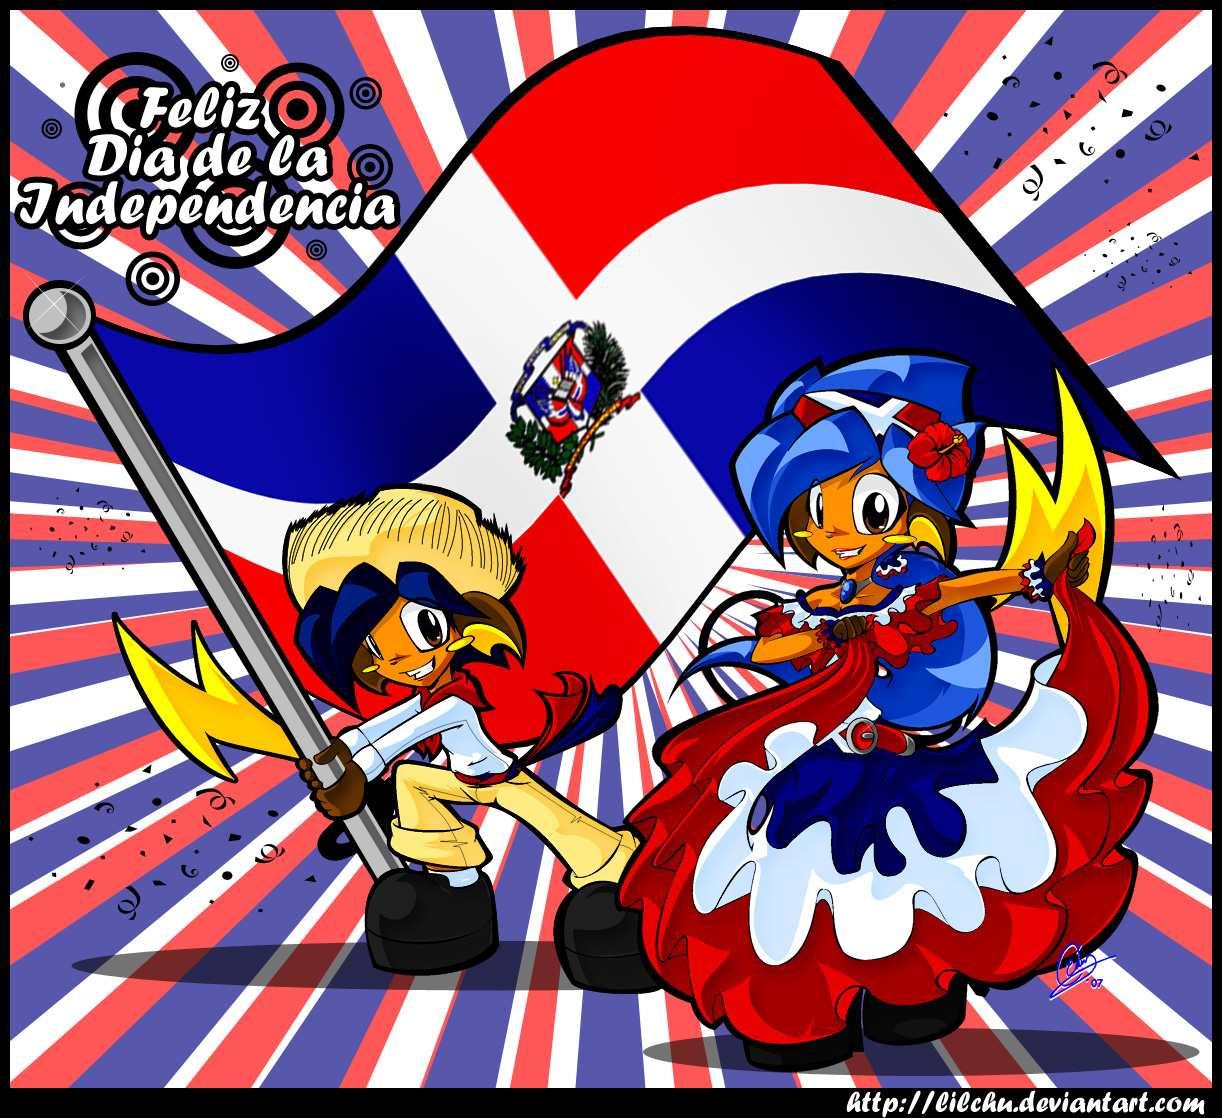 http://2.bp.blogspot.com/-Oc1aTsjDHps/USqS7TQY43I/AAAAAAAAeyg/D2Ra5Eq2PKM/s1600/IndependenceDay_LilChu.jpg